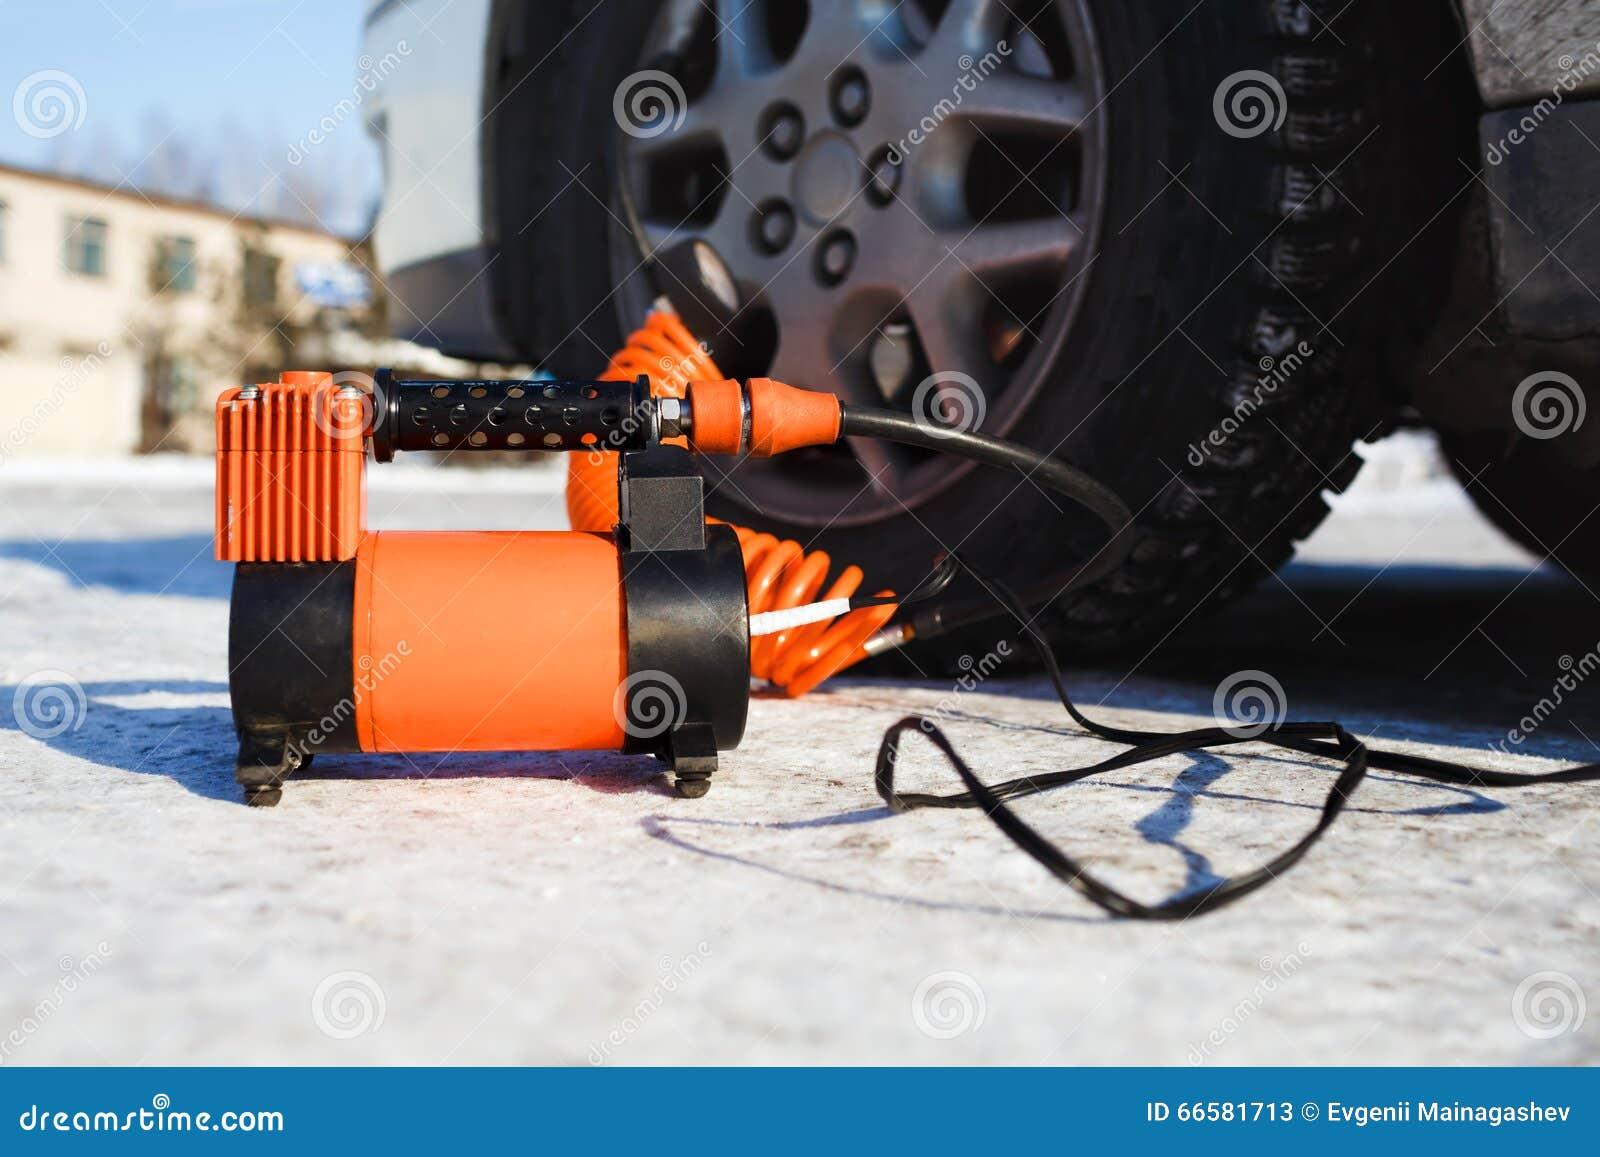 Air Compressor Car: Car Air Compressor In Working Position At Snow. Self